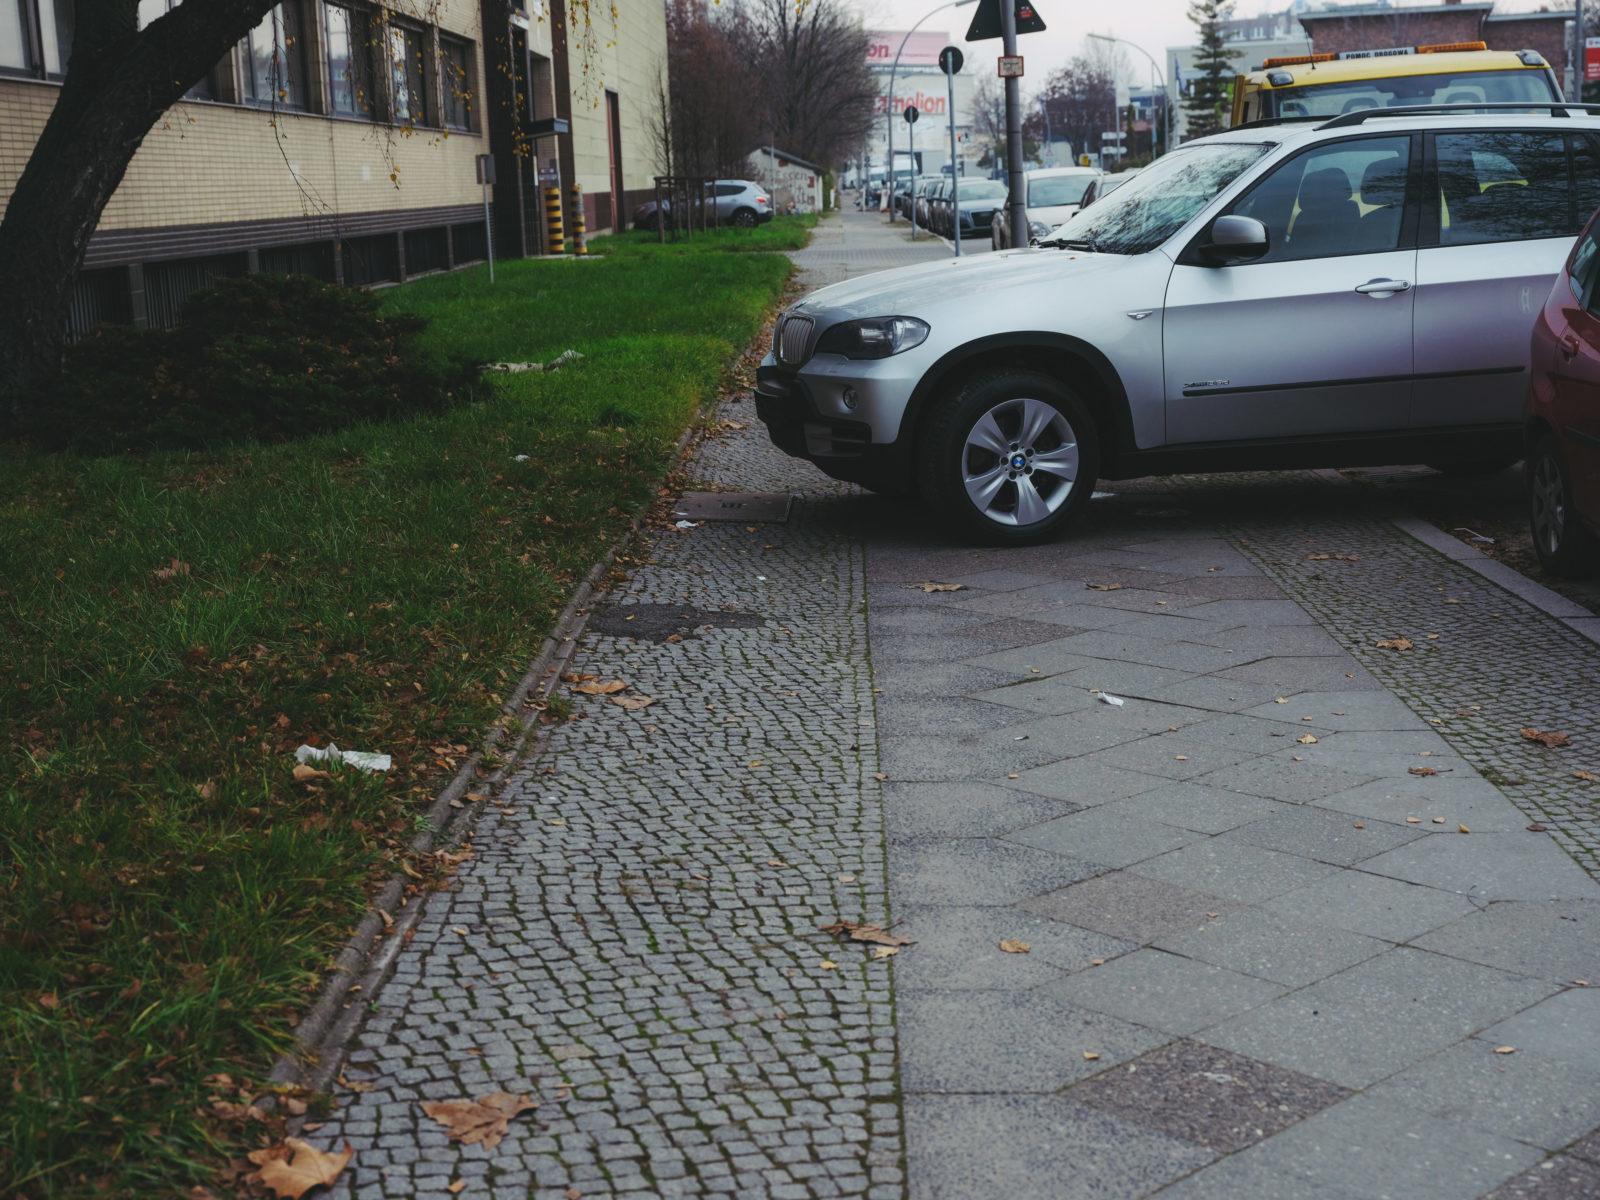 Gewerbegebiet Neuköllnische Allee